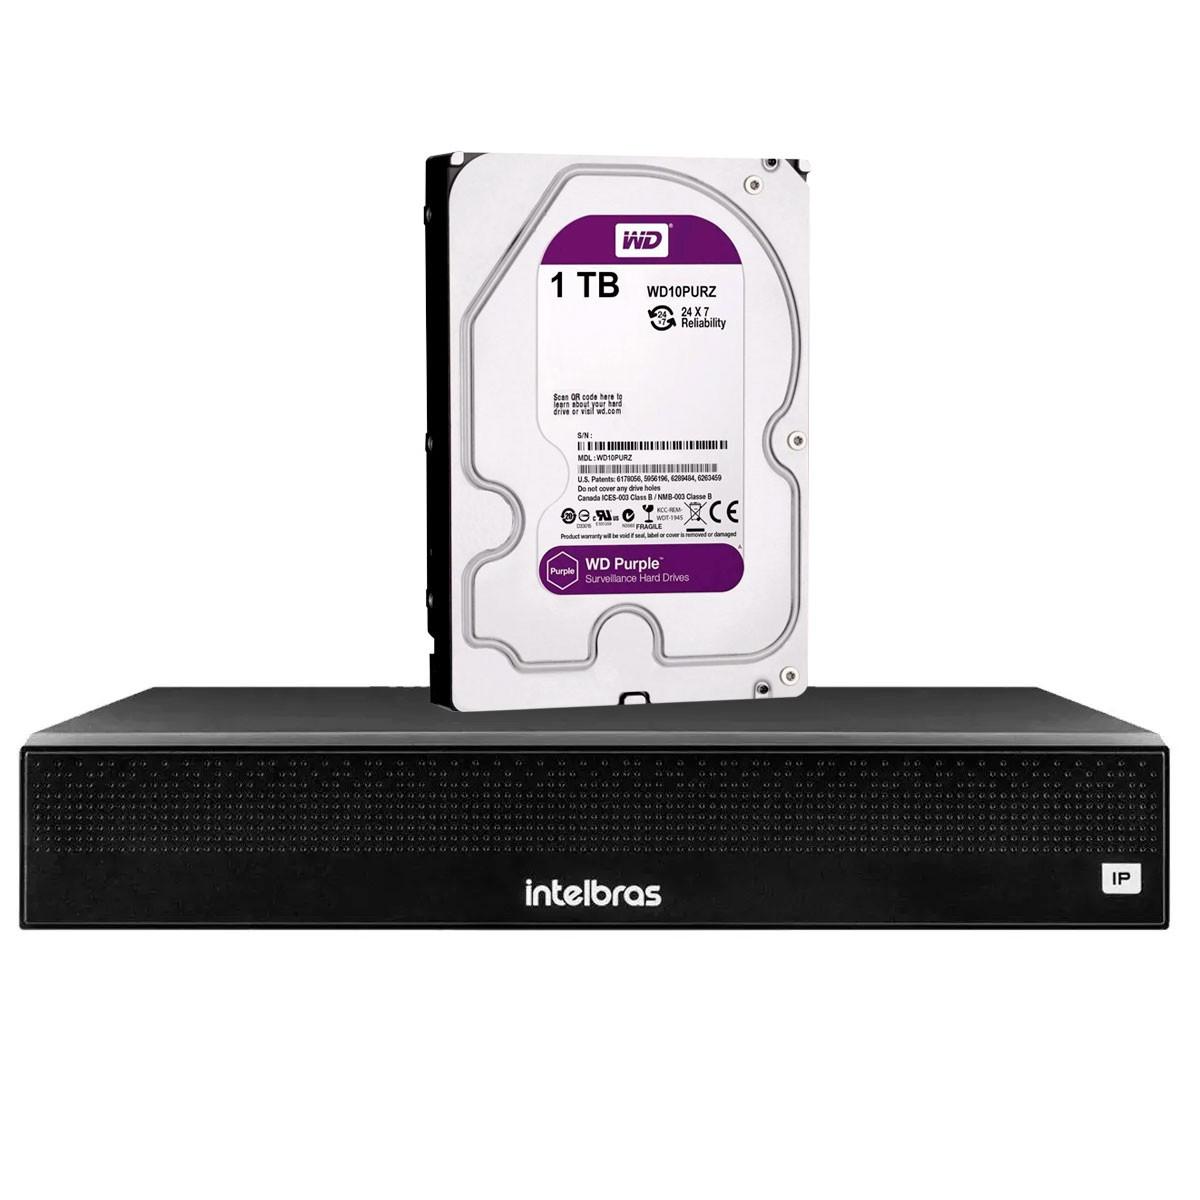 nvr-intelbras-04-canais-full-hd-1080p-6mp-nvd-1304-04-canais-hd-1tb-wd-purple